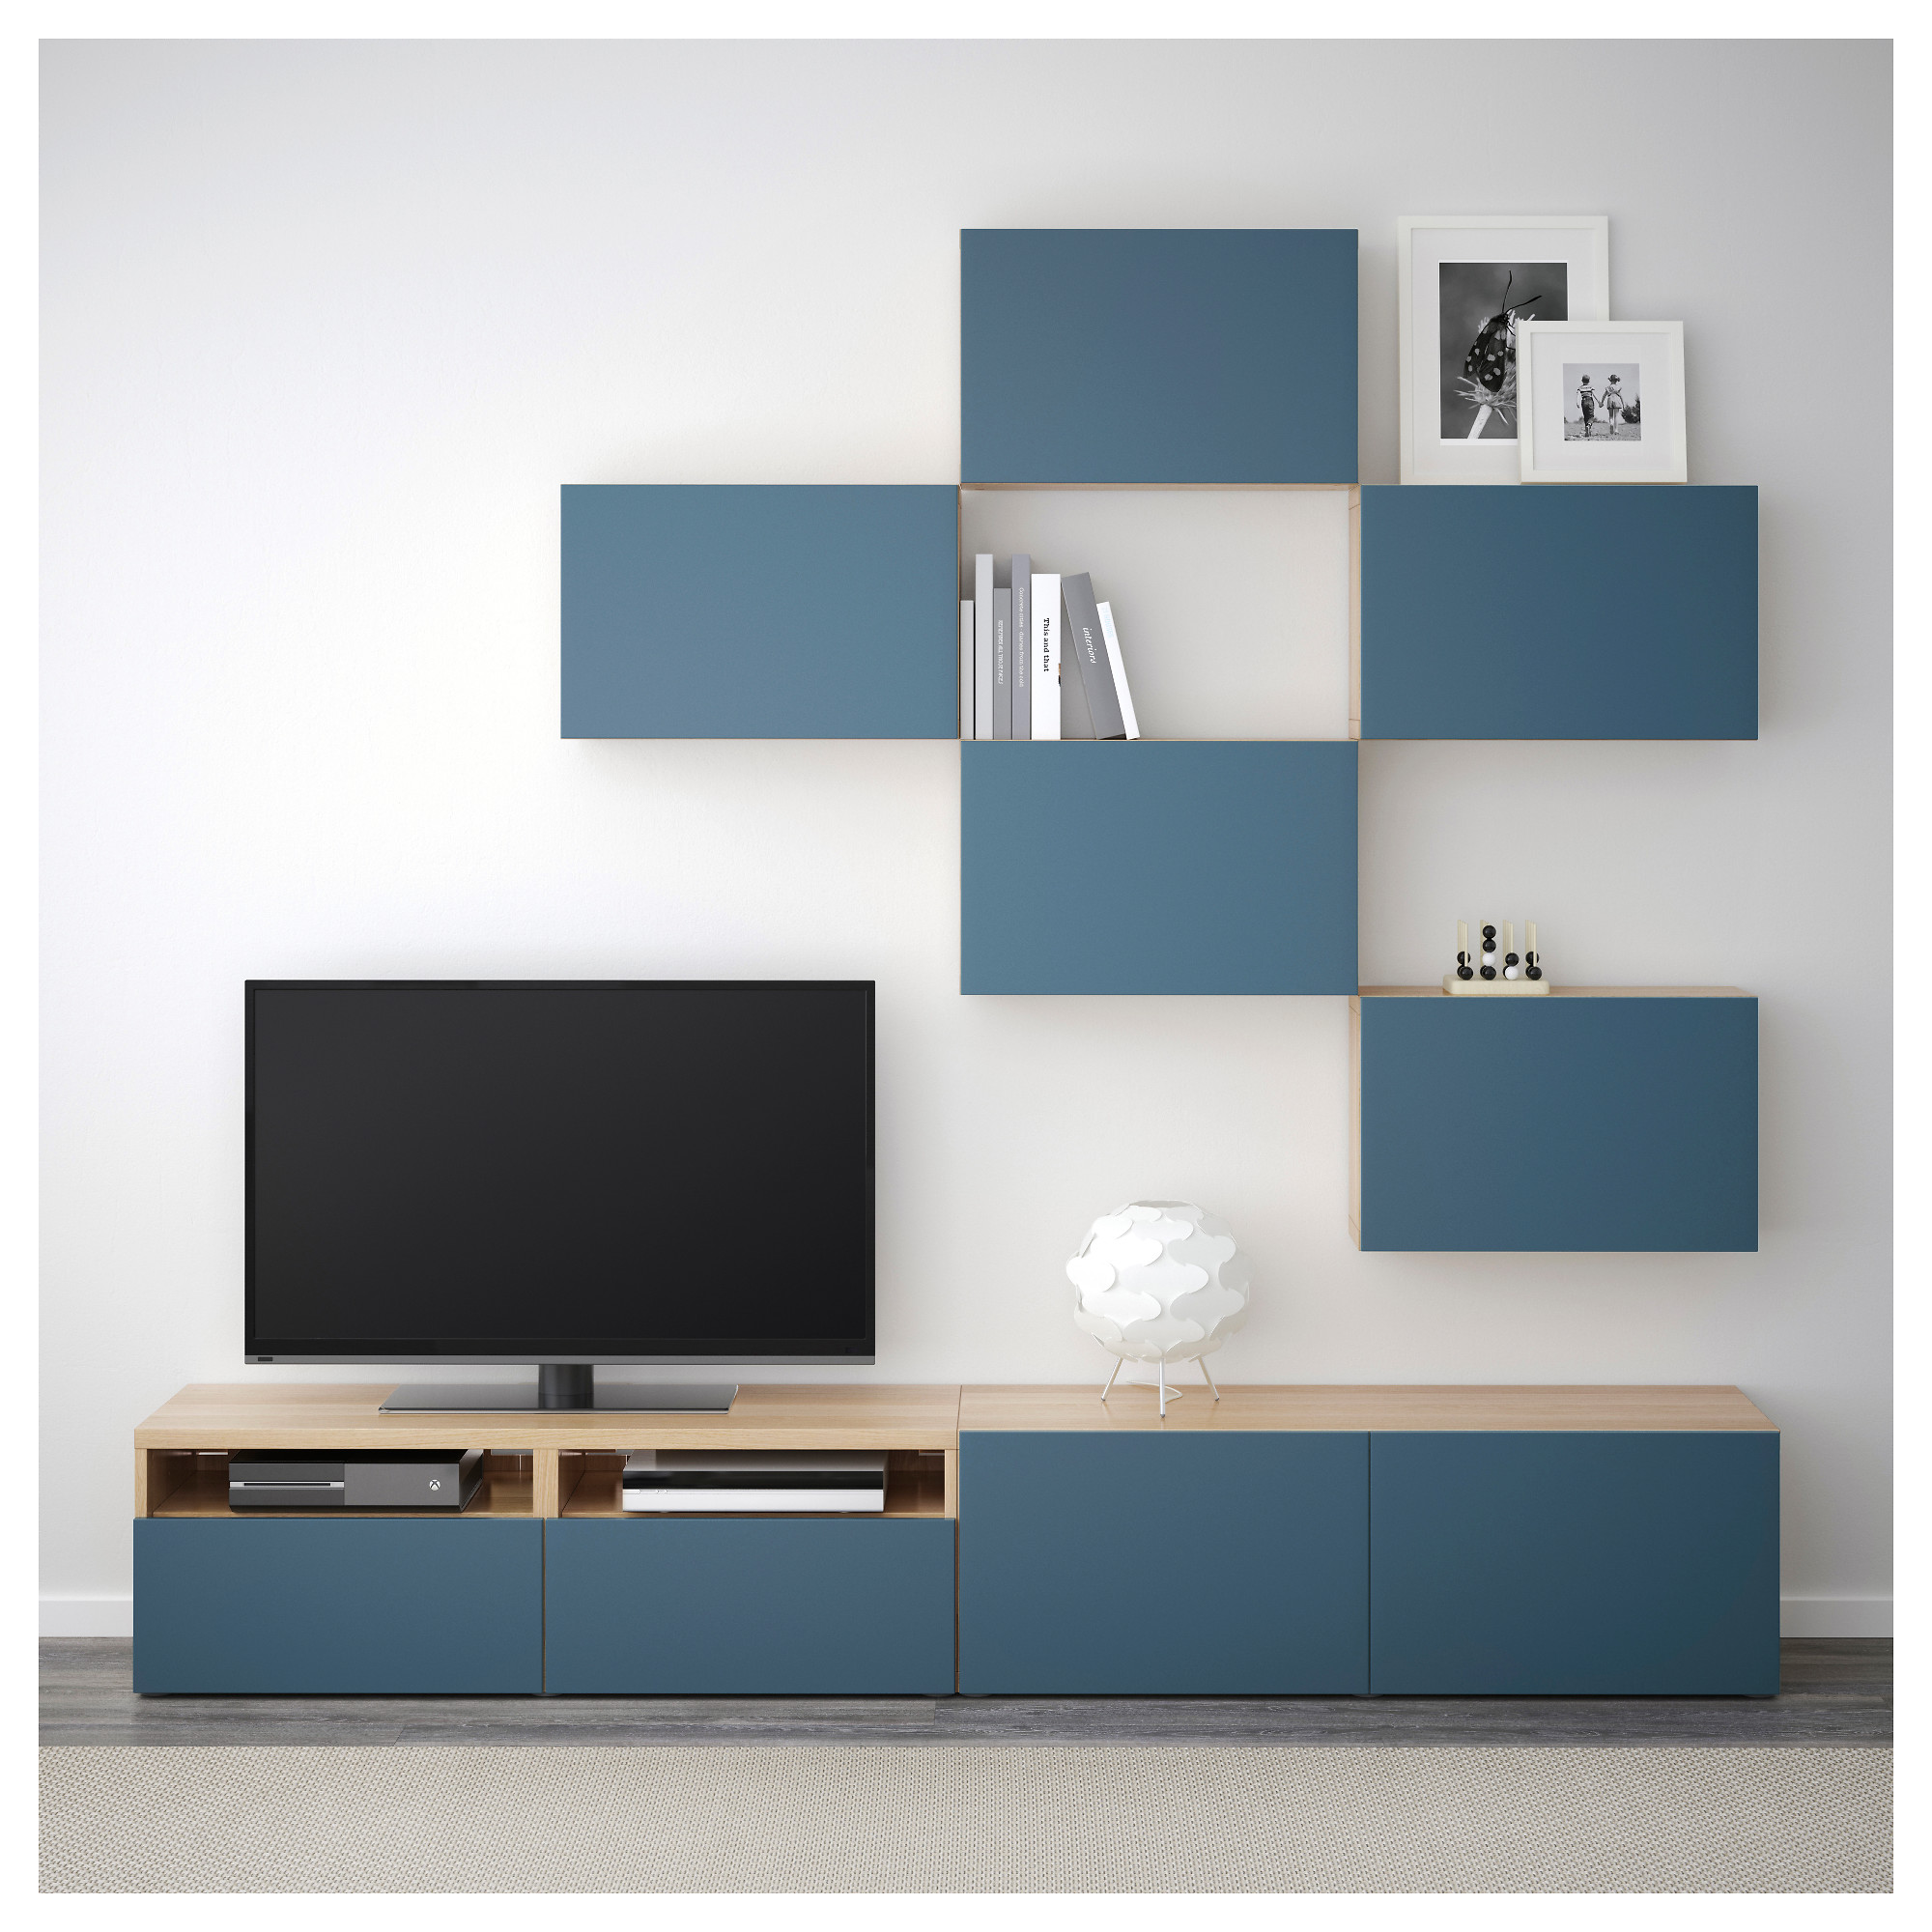 Шкаф для ТВ, комбинация БЕСТО темно-синий артикуль № 792.516.65 в наличии. Online магазин IKEA Минск. Недорогая доставка и установка.